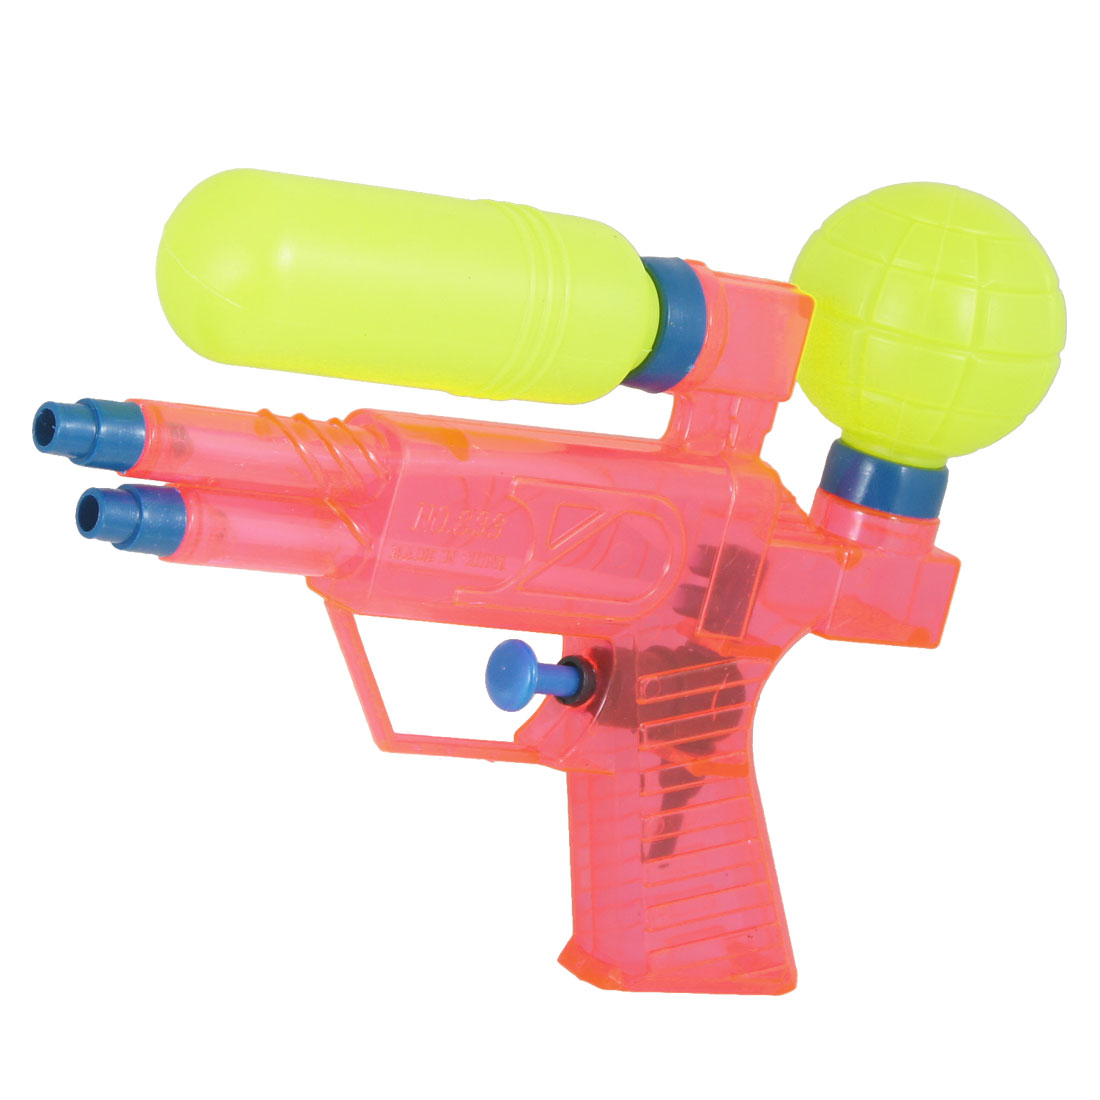 Children Play Pink Yellow Blue Plastic Water Squirt Gun Toy